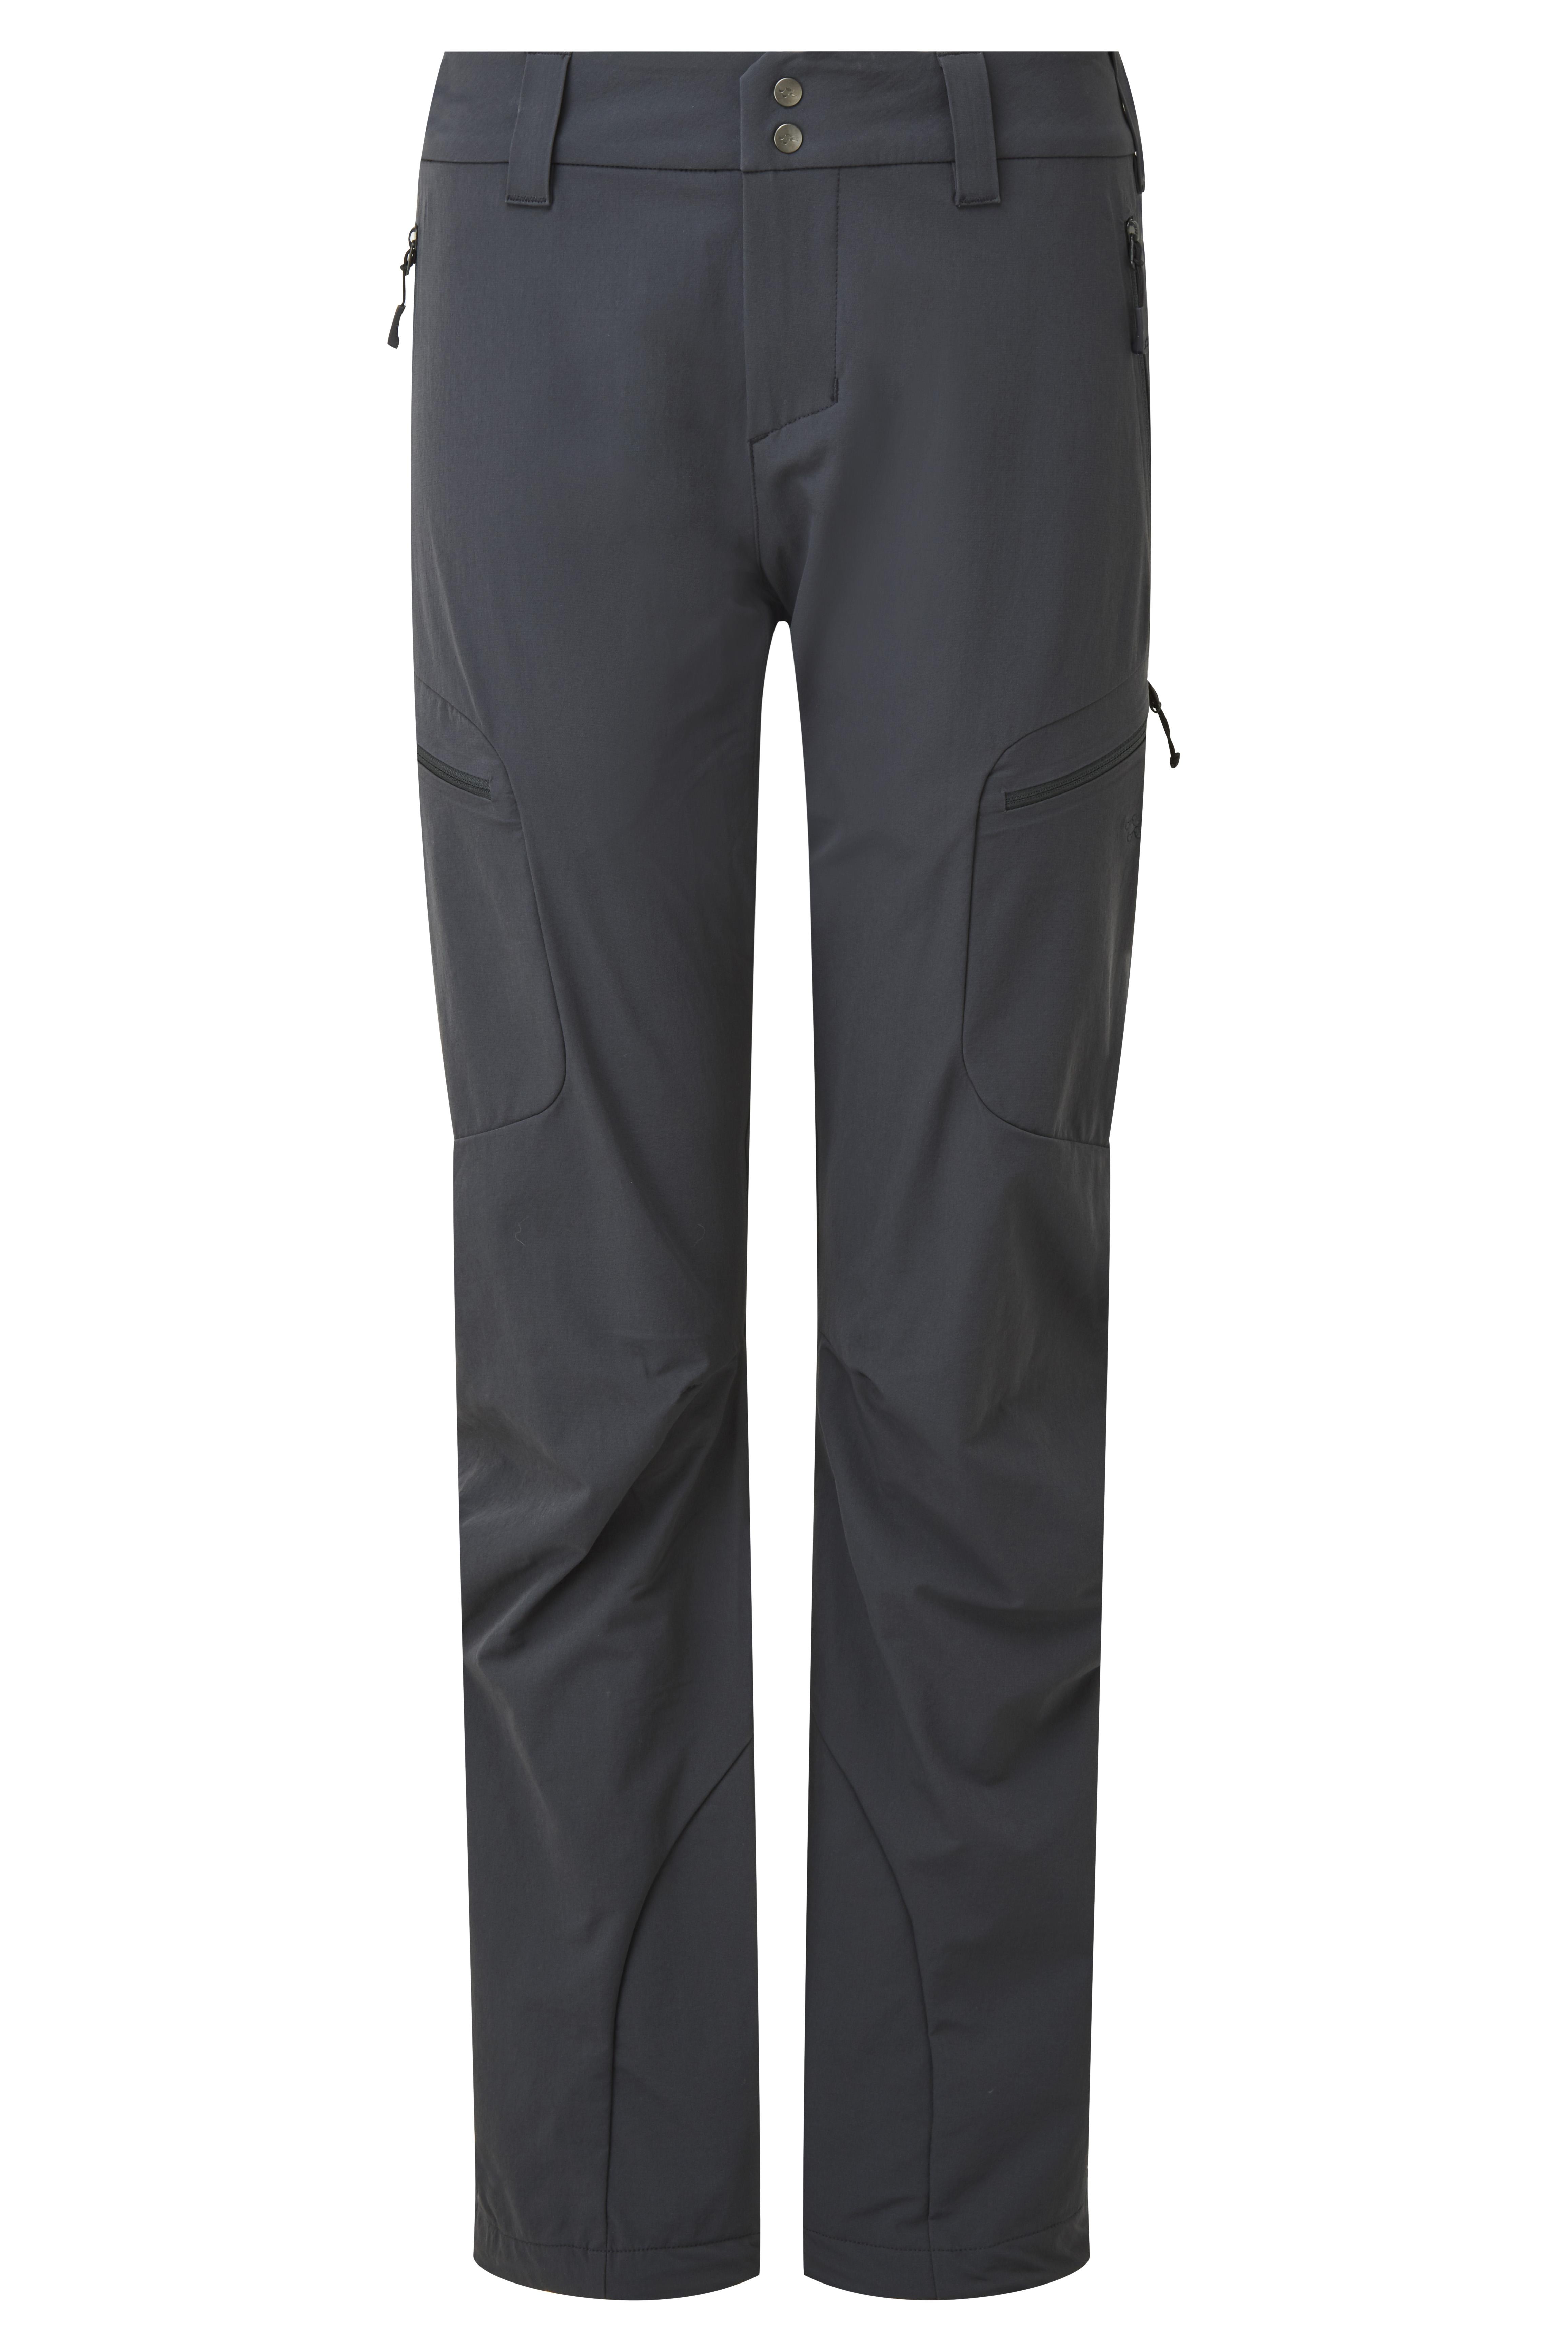 Rab Women's Sawtooth Pants Short Leg 0